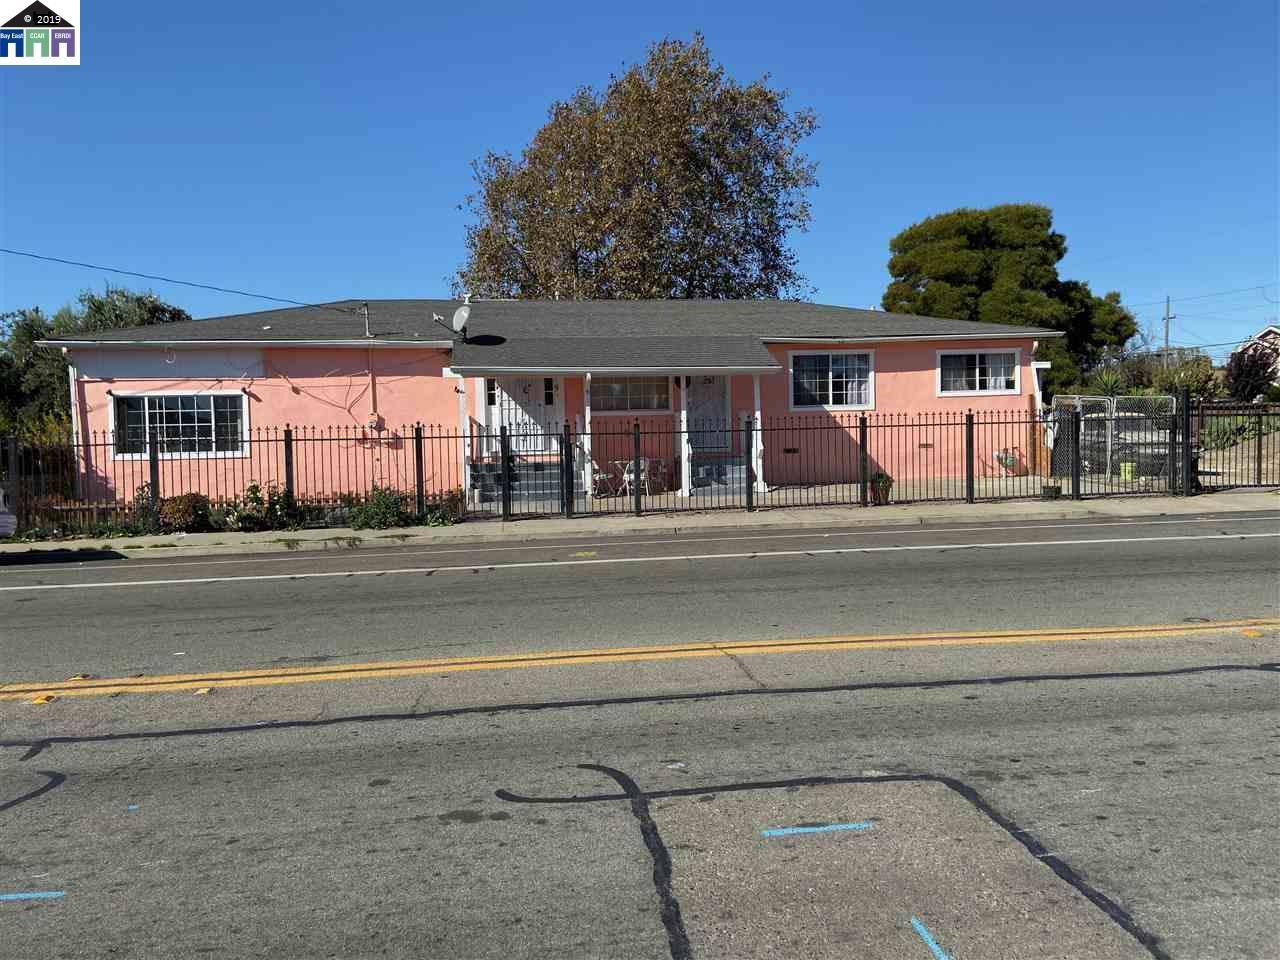 1653 FRED JACKSON WAY, RICHMOND, CA 94801